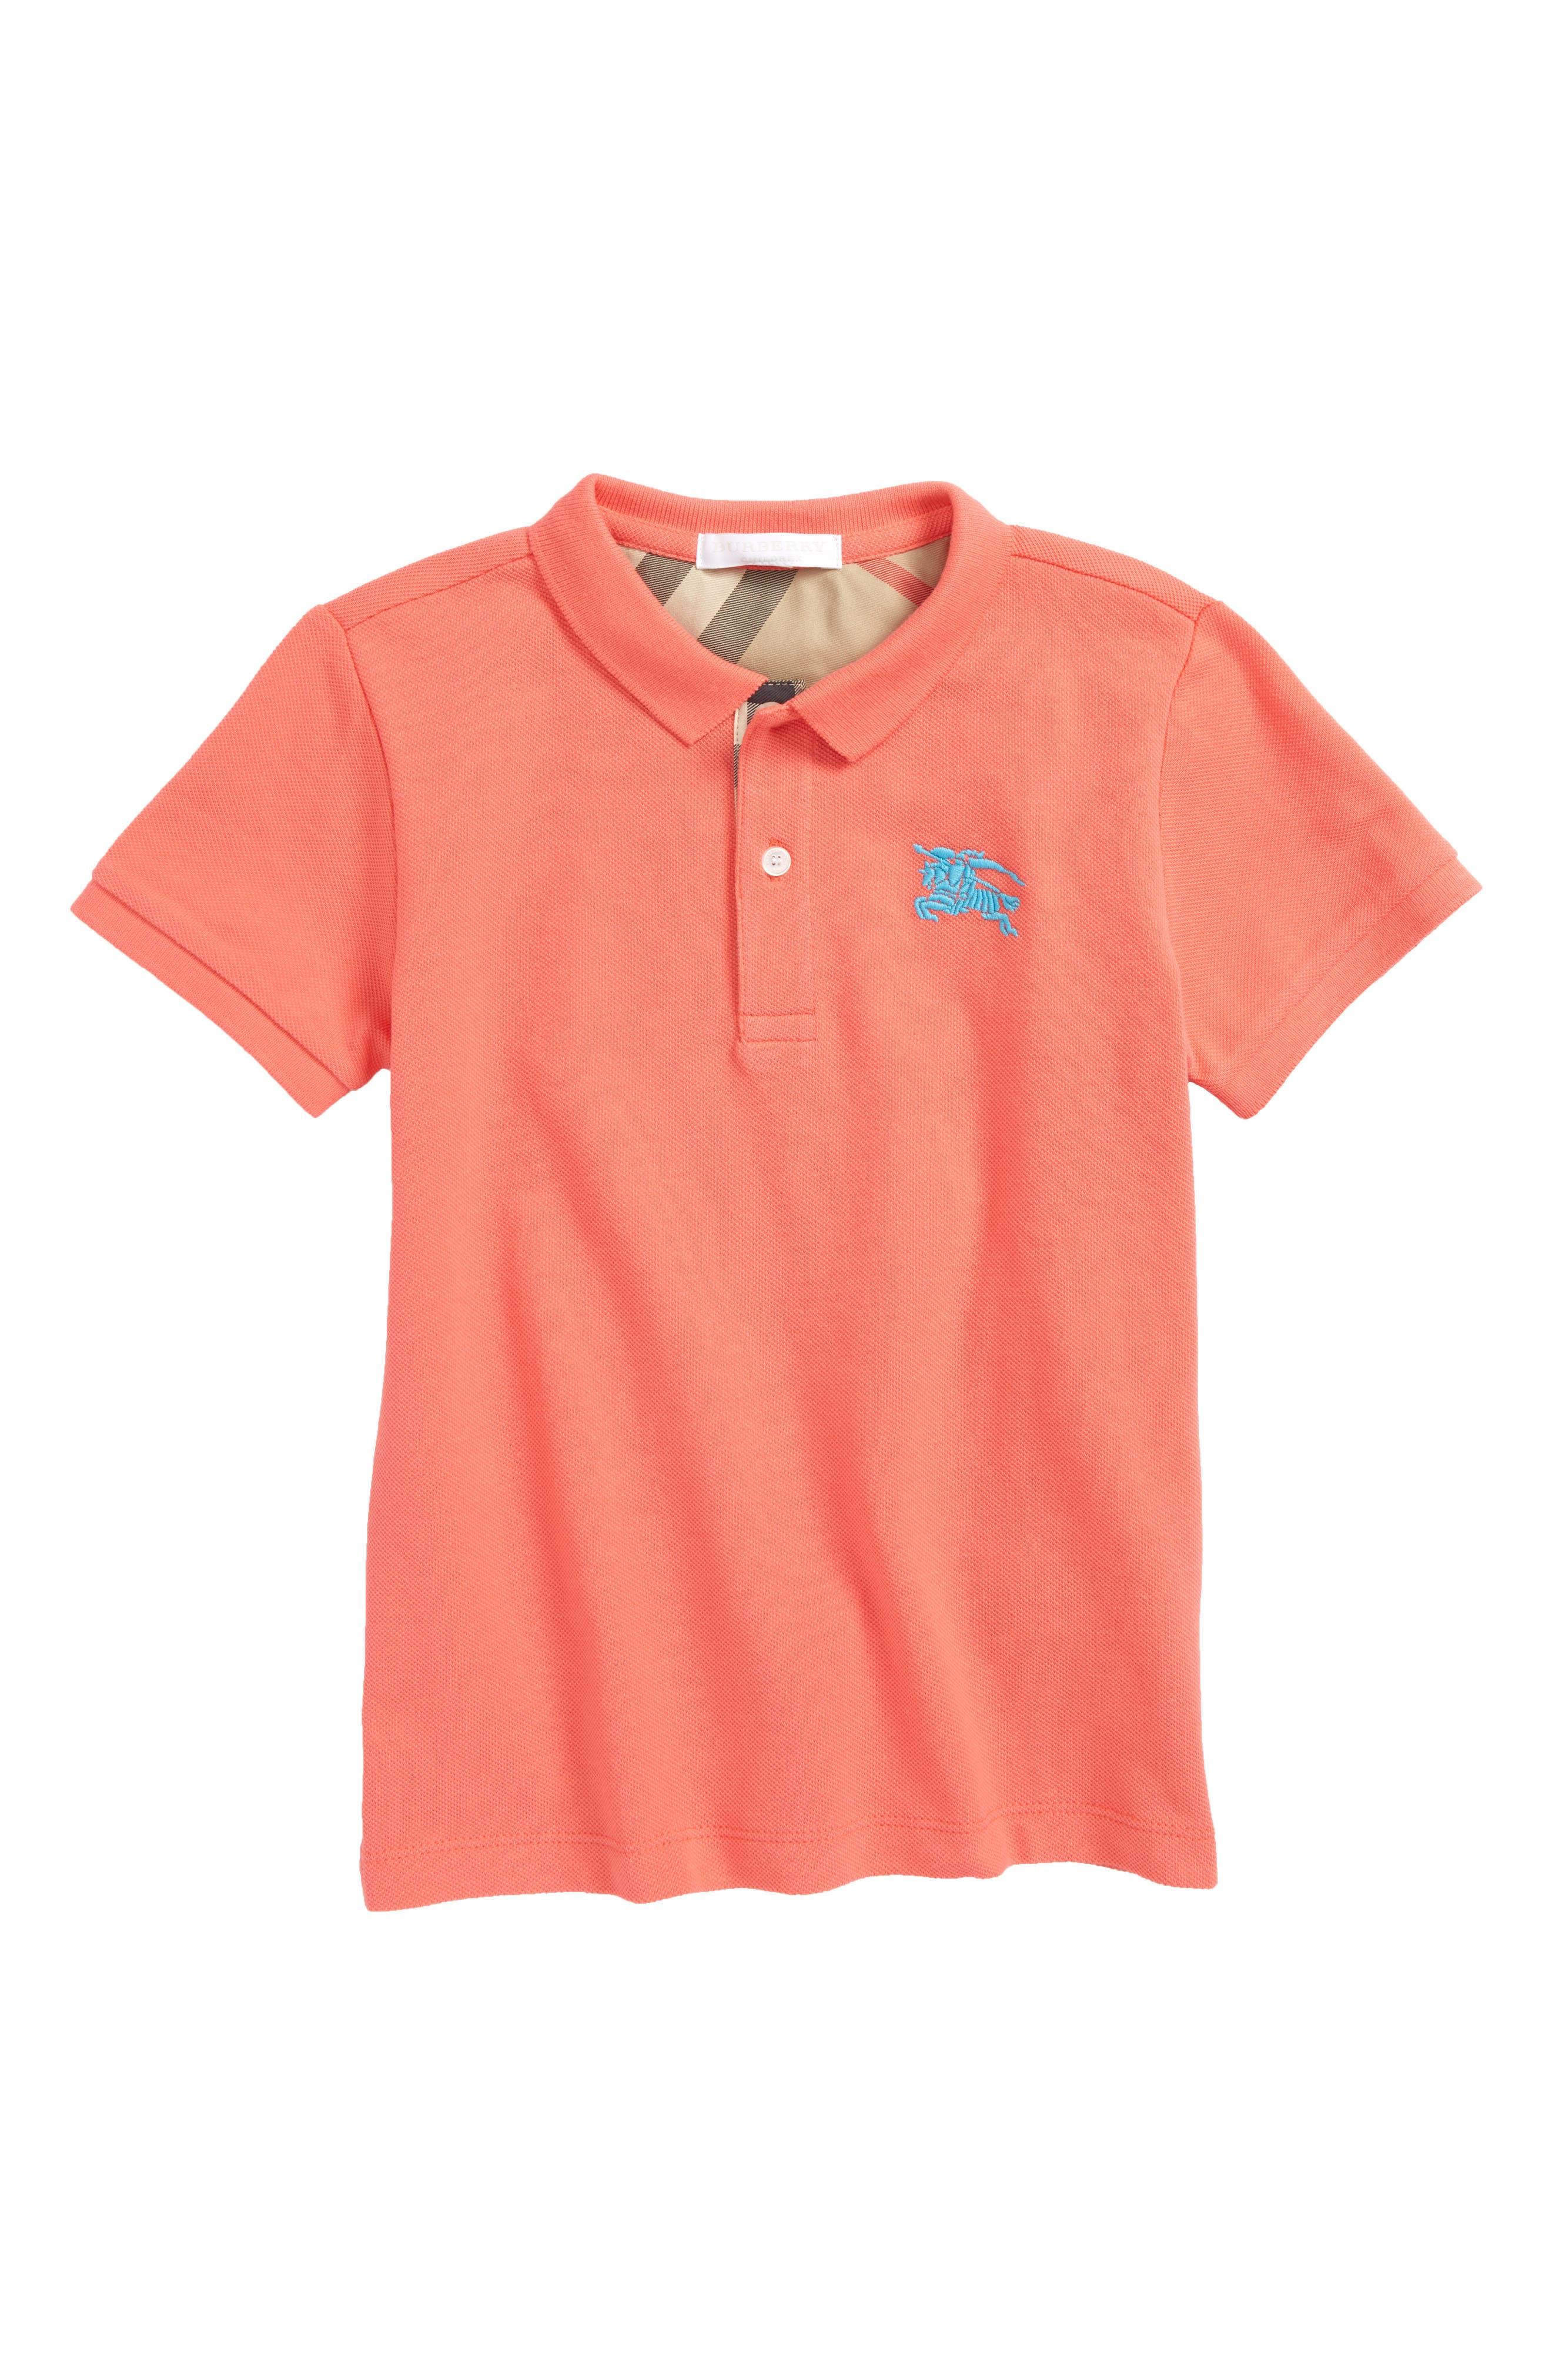 Cotton Piqué Polo,                             Main thumbnail 1, color,                             Bright Coral Pink